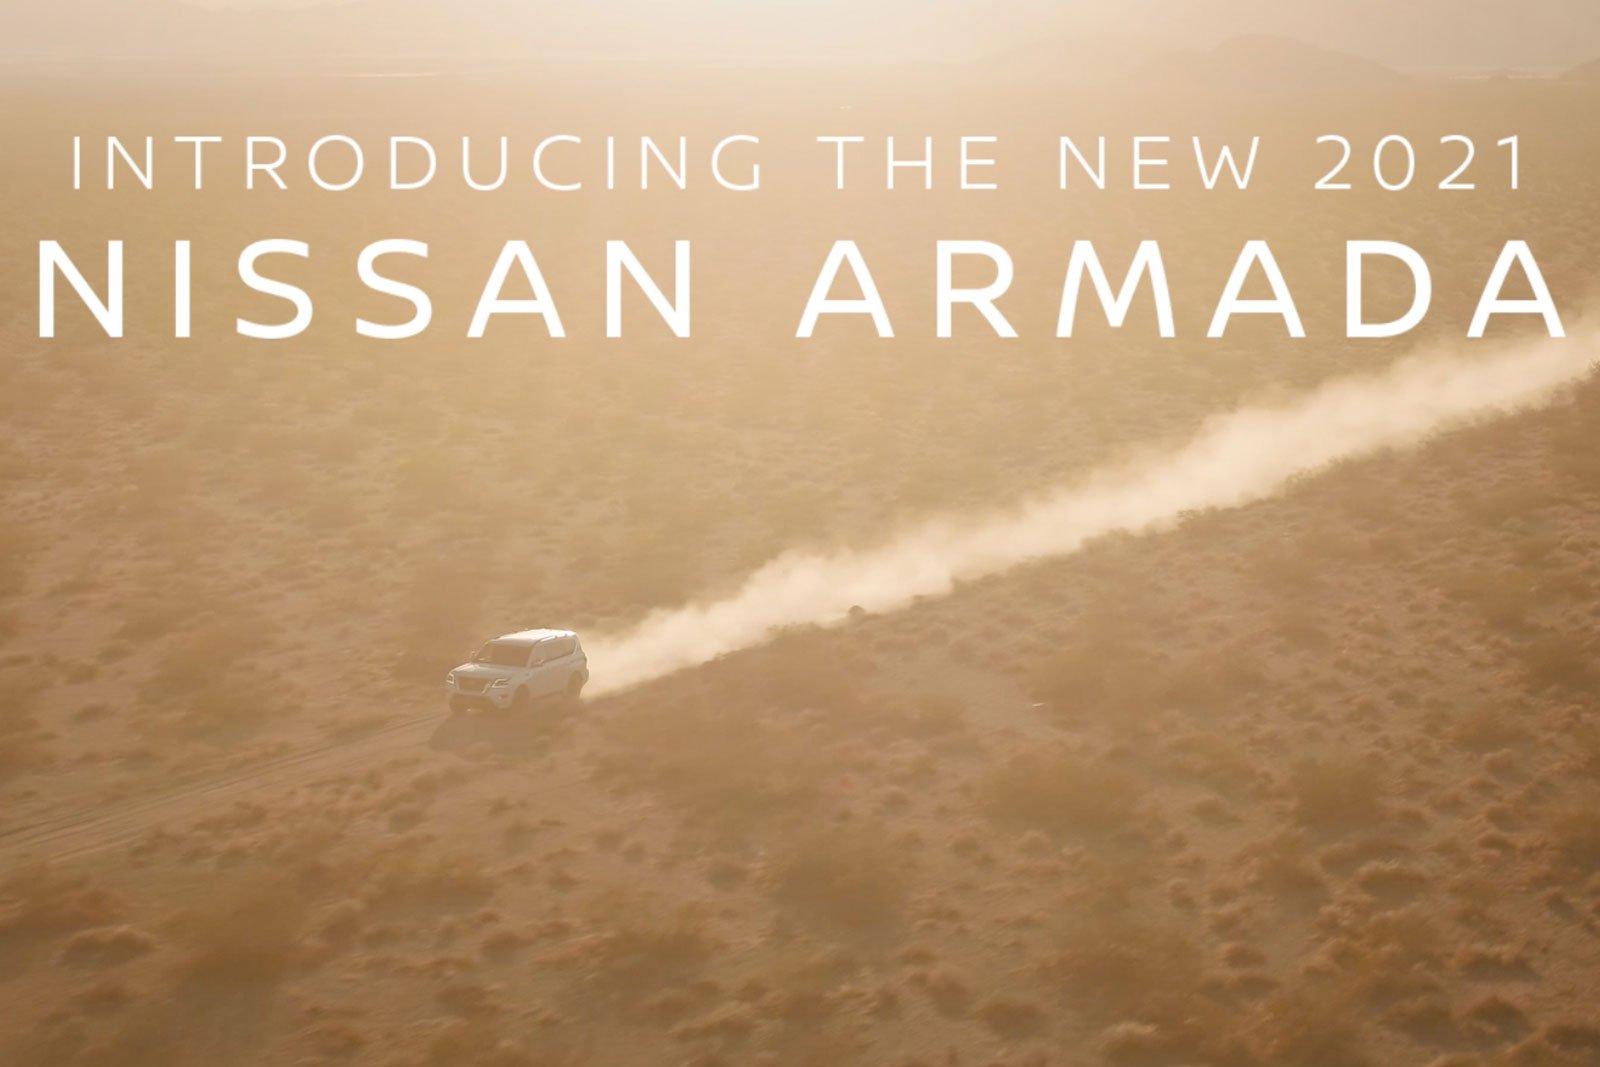 2021 Nissan Armada